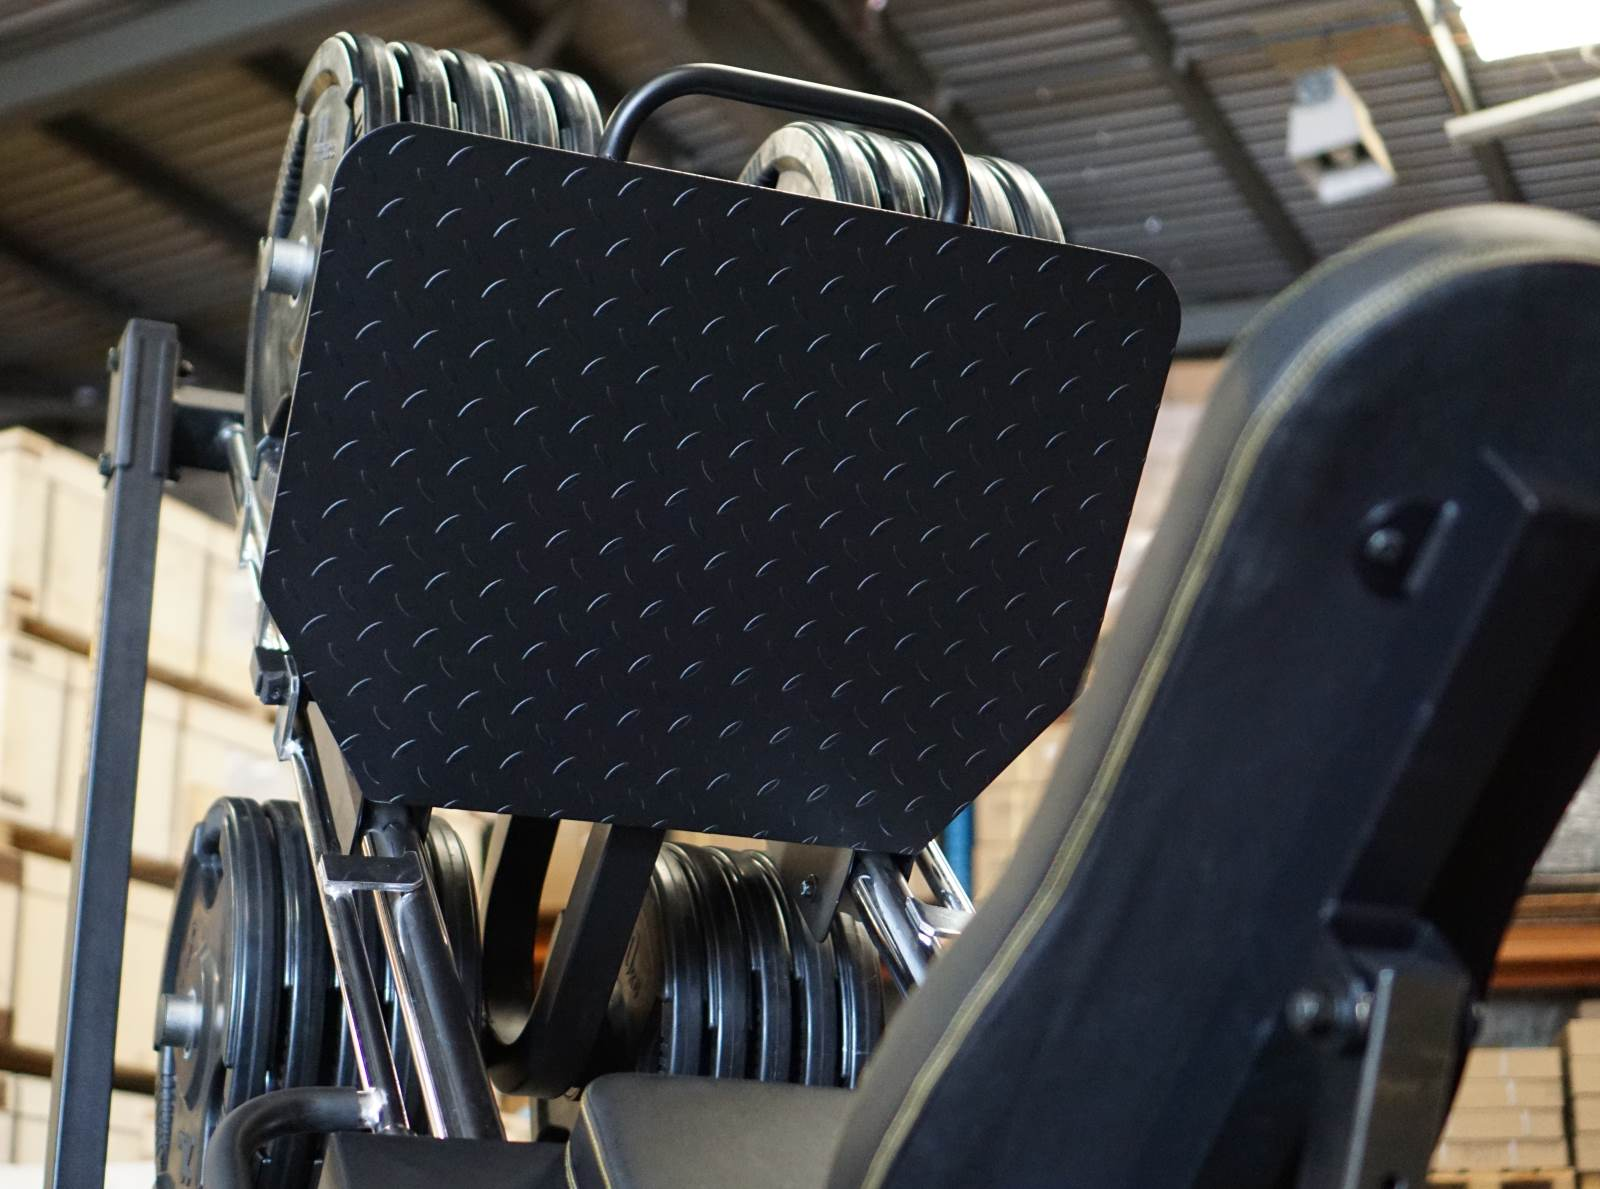 Powertec leg press package